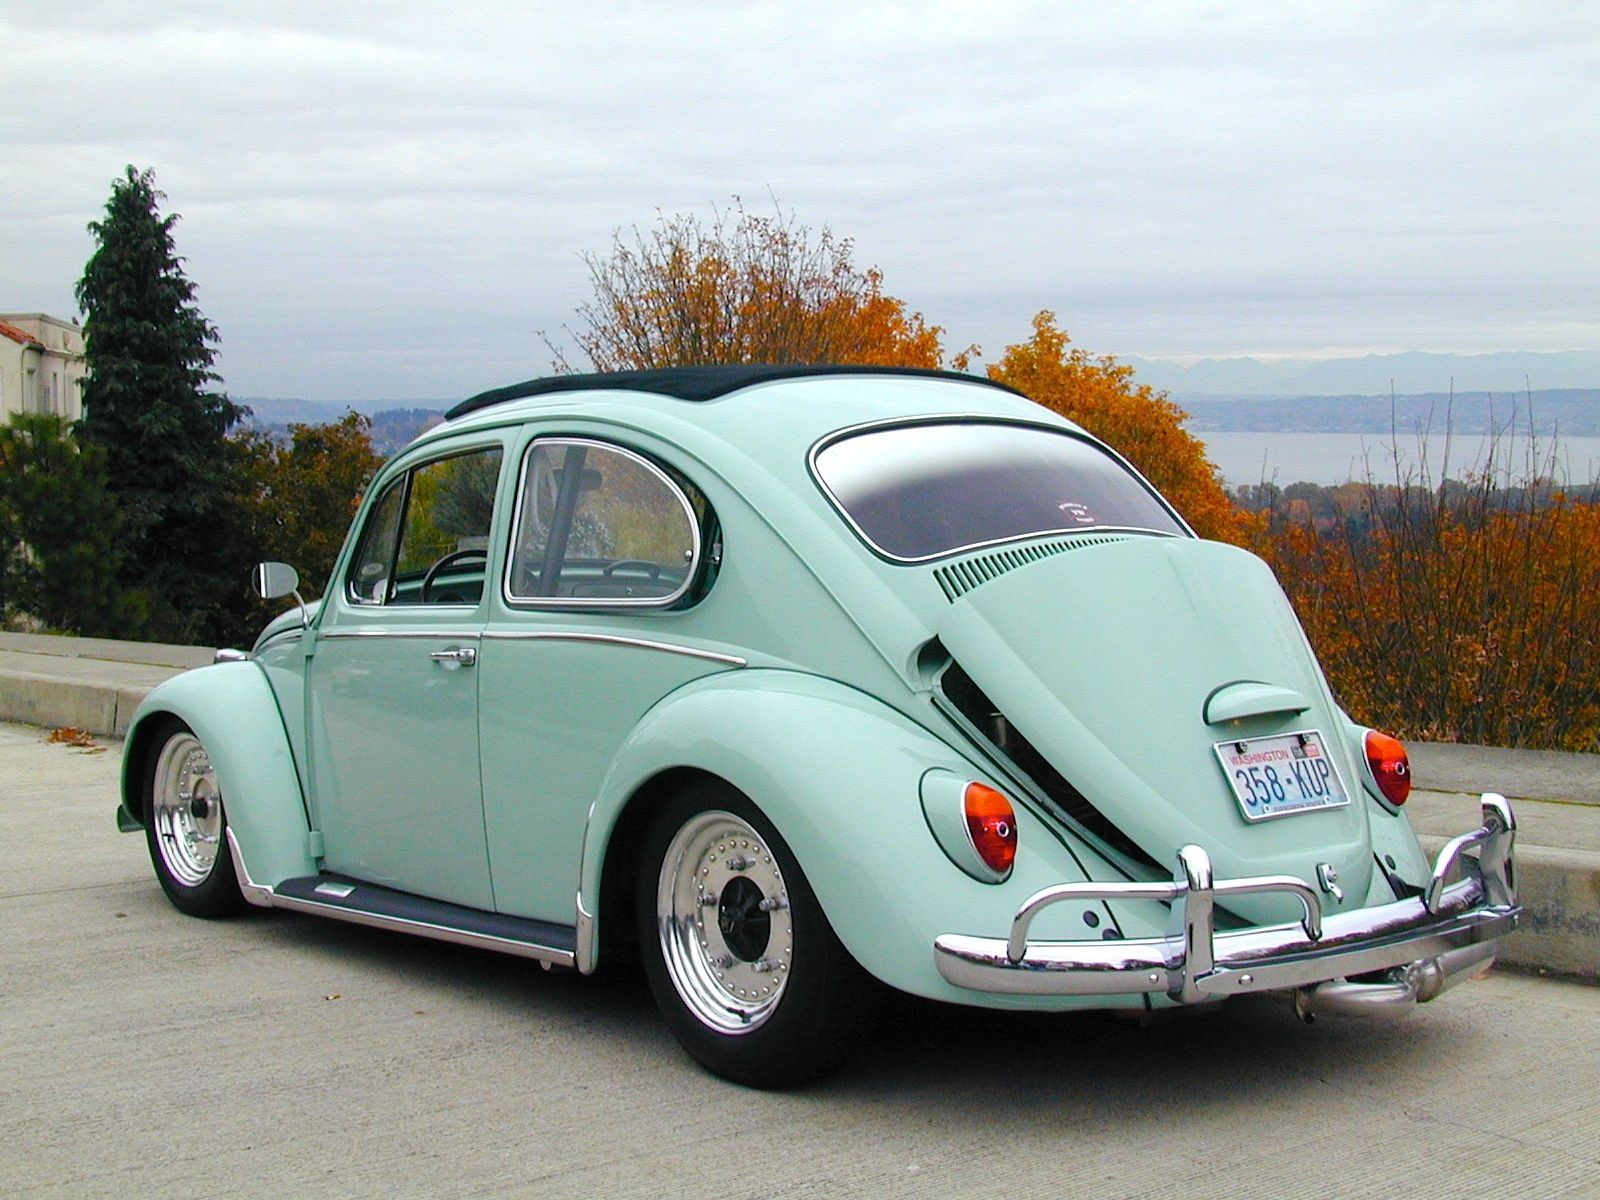 VW Beetle California Style Sweet Vee dubs